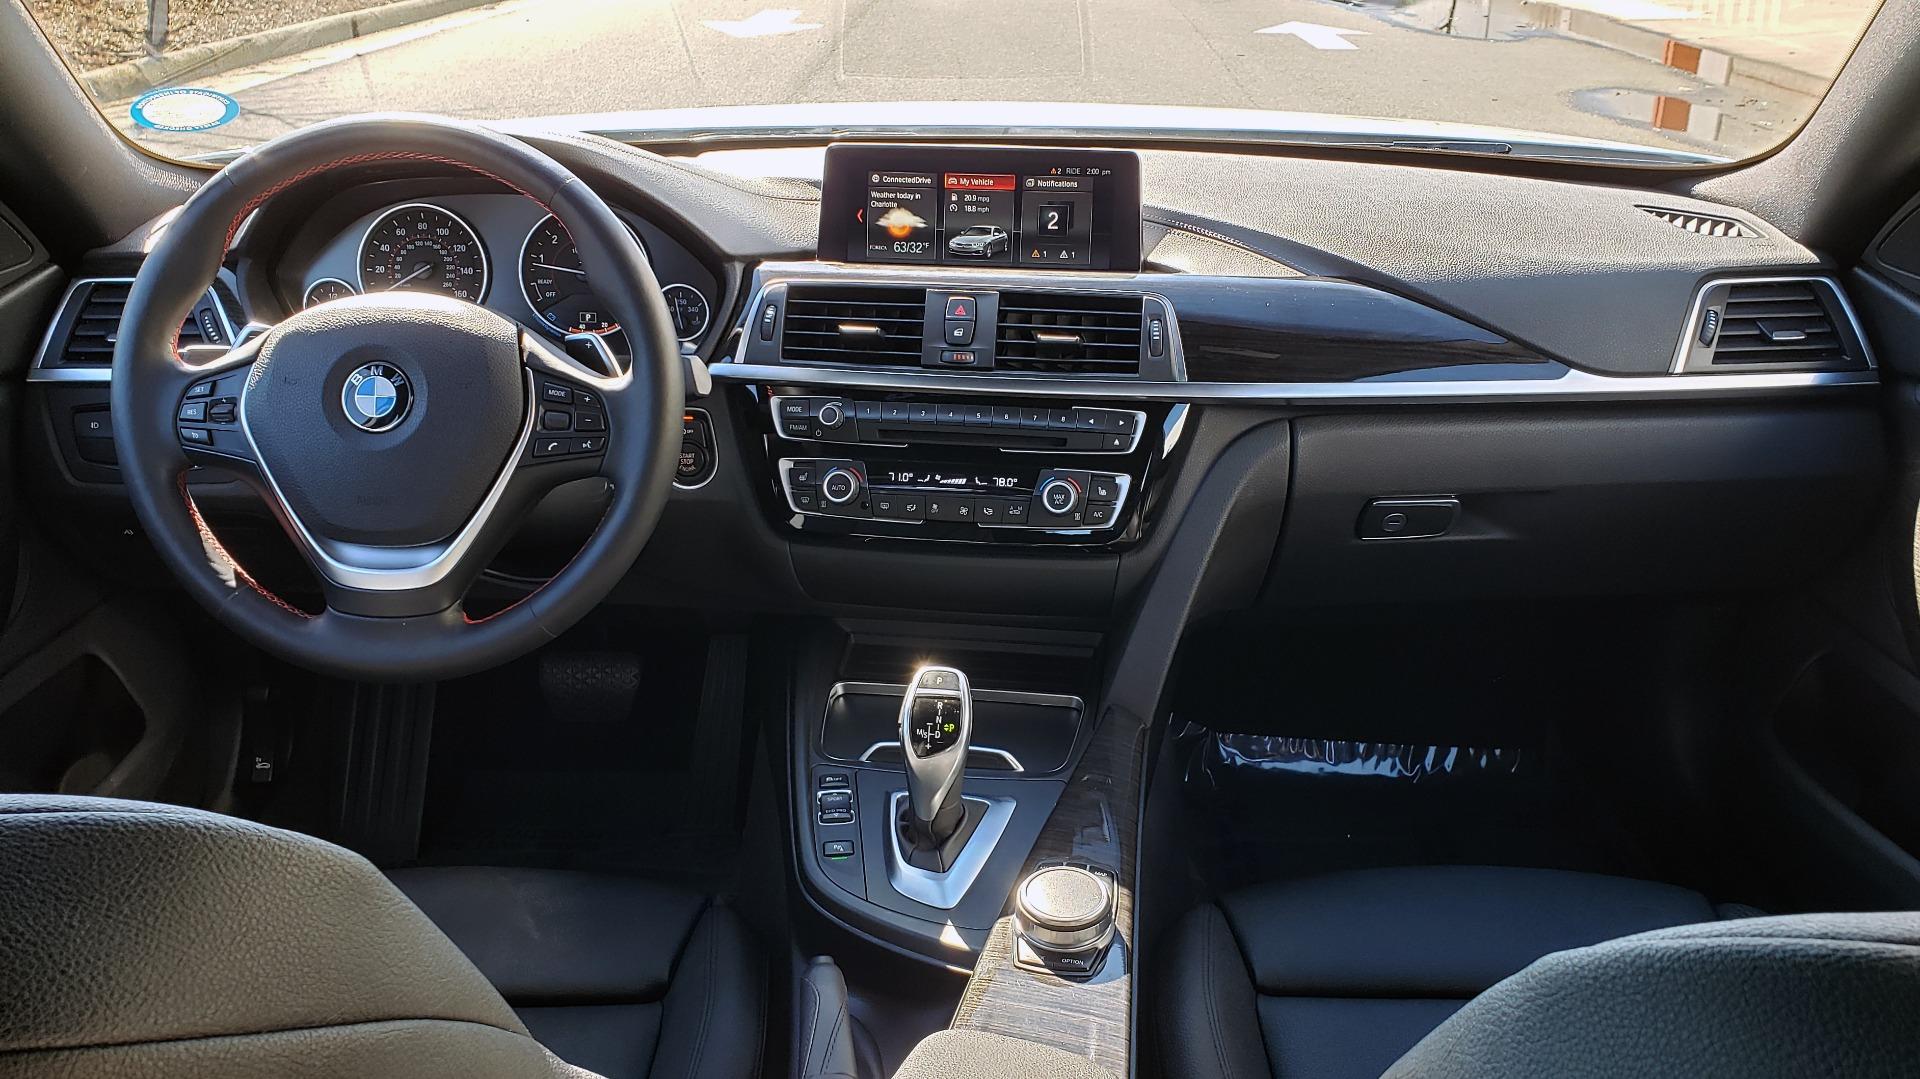 Used 2018 BMW 4 SERIES 430IXDRIVE / PREMIUM / NAV / SUNROOF / ESSENTIALS PKG for sale $28,995 at Formula Imports in Charlotte NC 28227 81